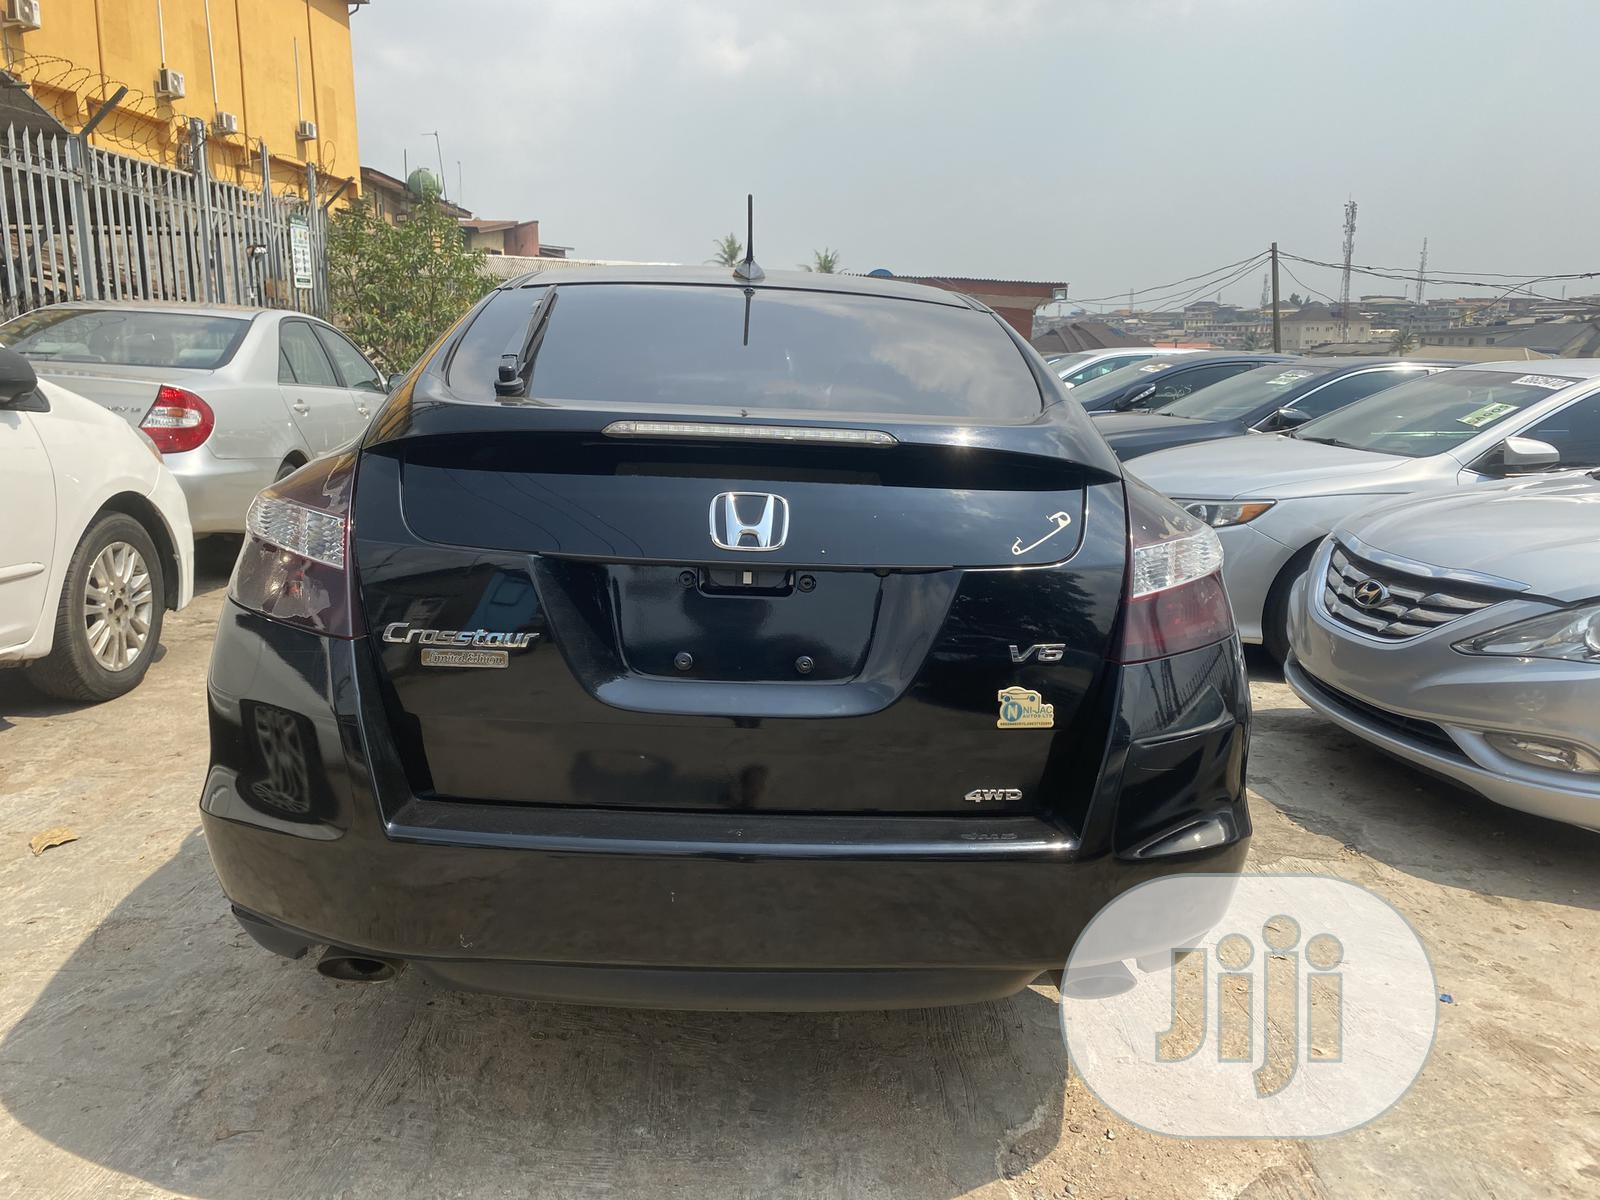 Honda Accord CrossTour 2012 EX-L Black   Cars for sale in Magodo, Lagos State, Nigeria